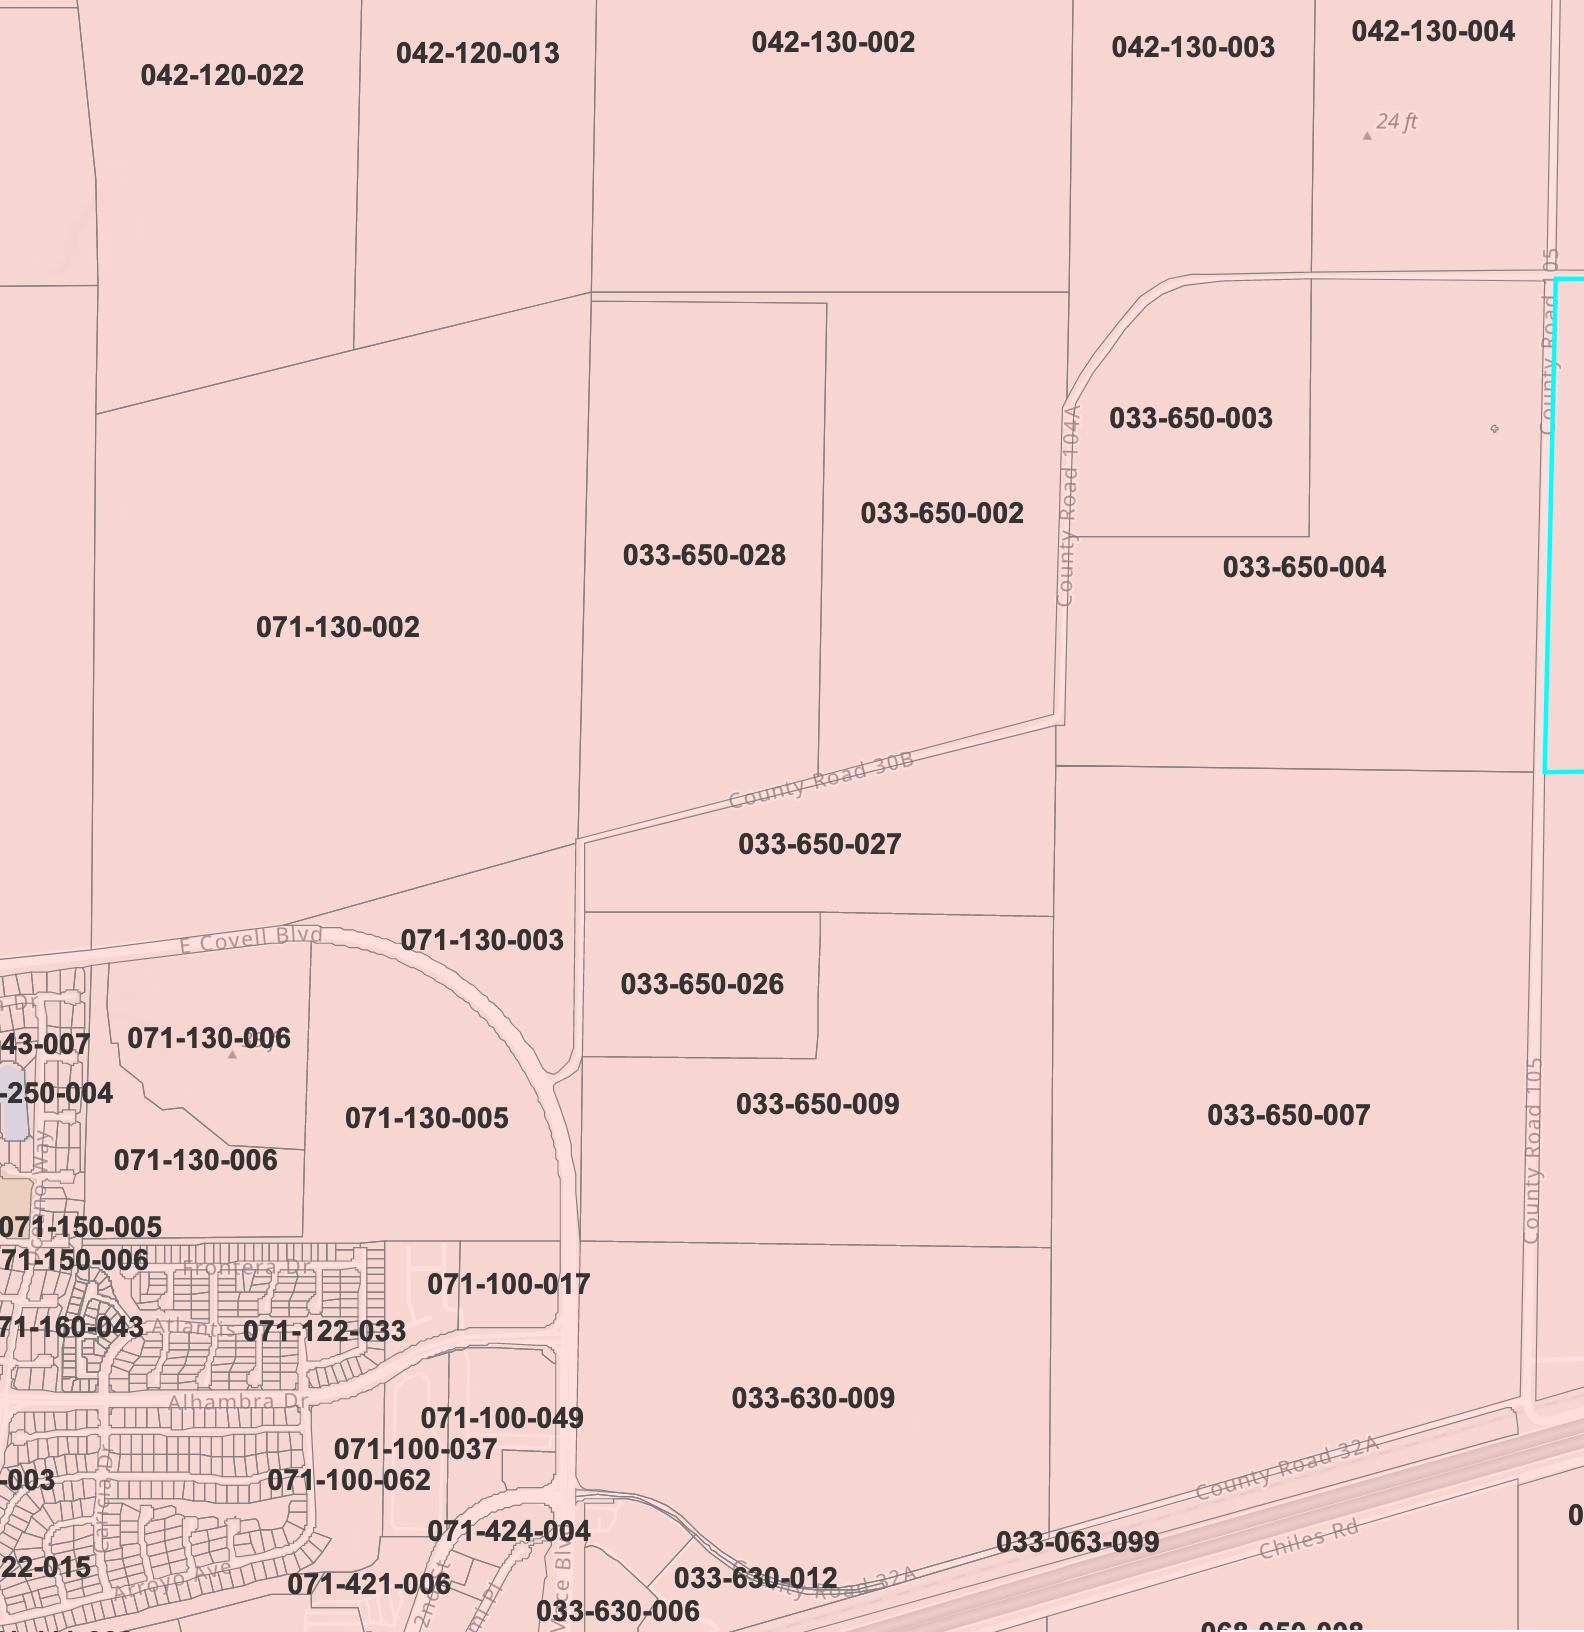 https://www.davisvanguard.org/wp-content/uploads/2020/03/Yolo-GIS-image-of-Mace-Curve.png